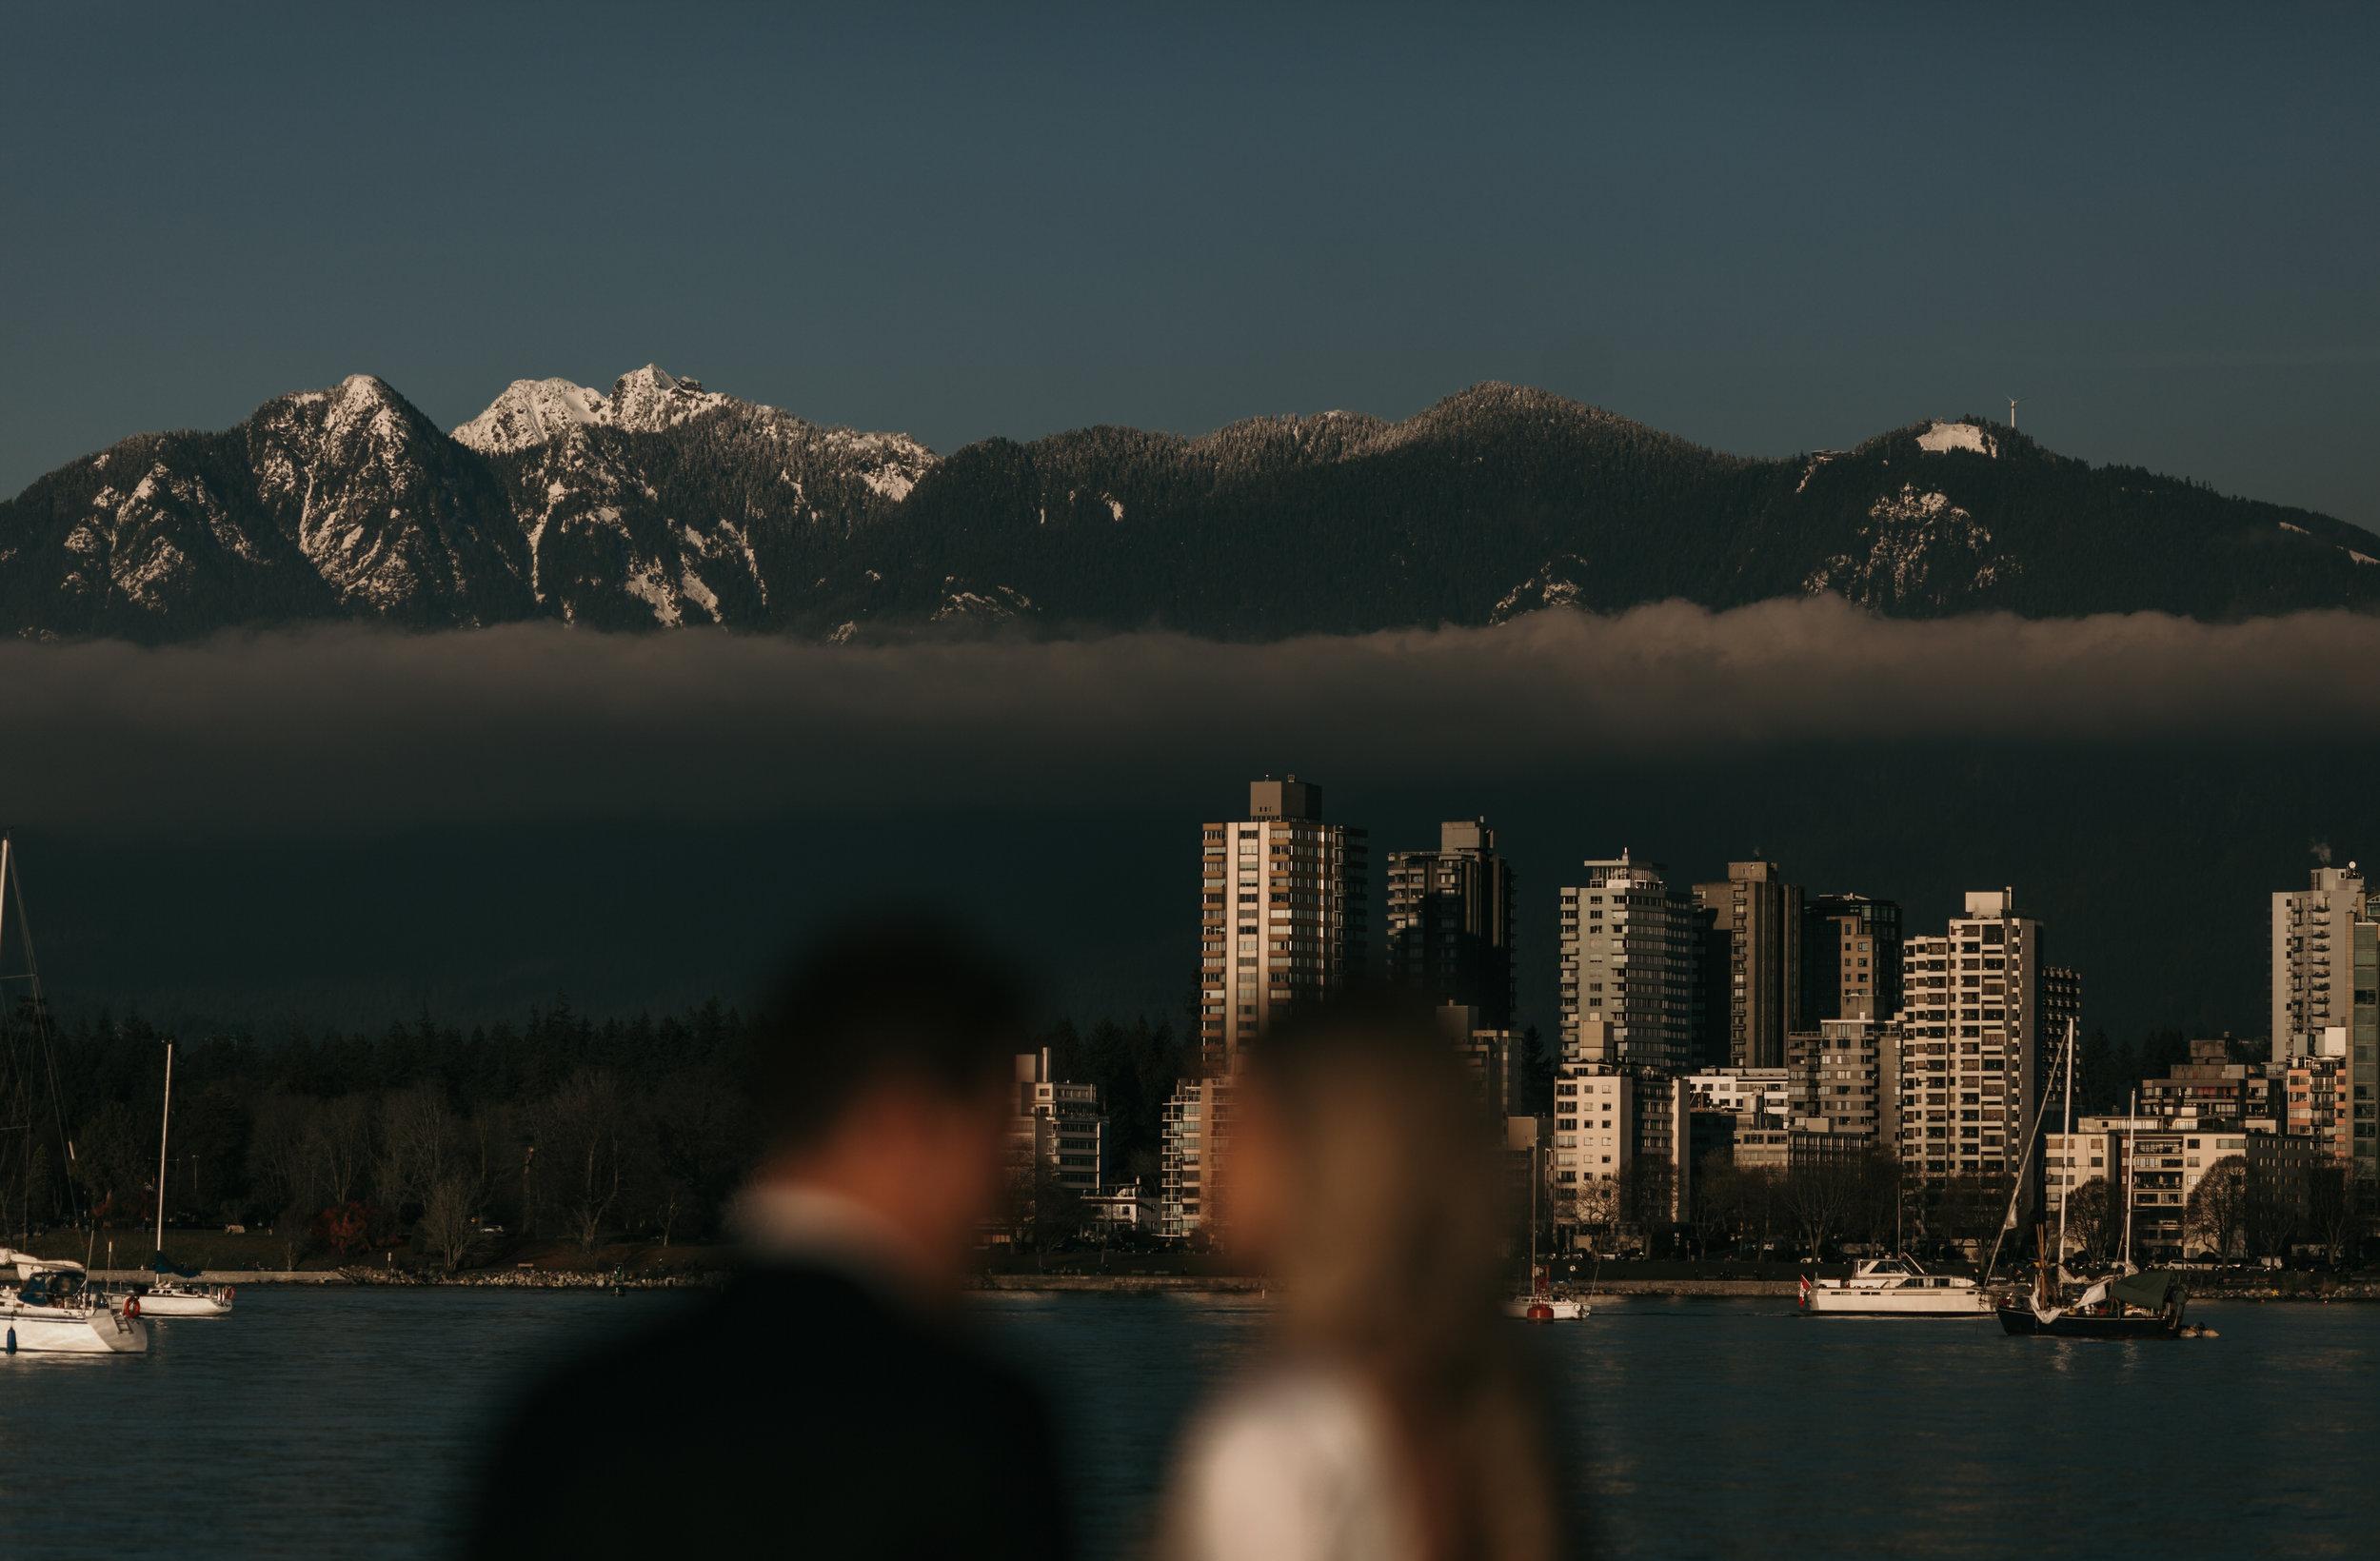 Vancouver Wedding Photos - Vegan Wedding Photographer - New Years Eve Wedding Photos - Vancouver Wedding Photographer - Vancouver Wedding Videographer - 780.JPG